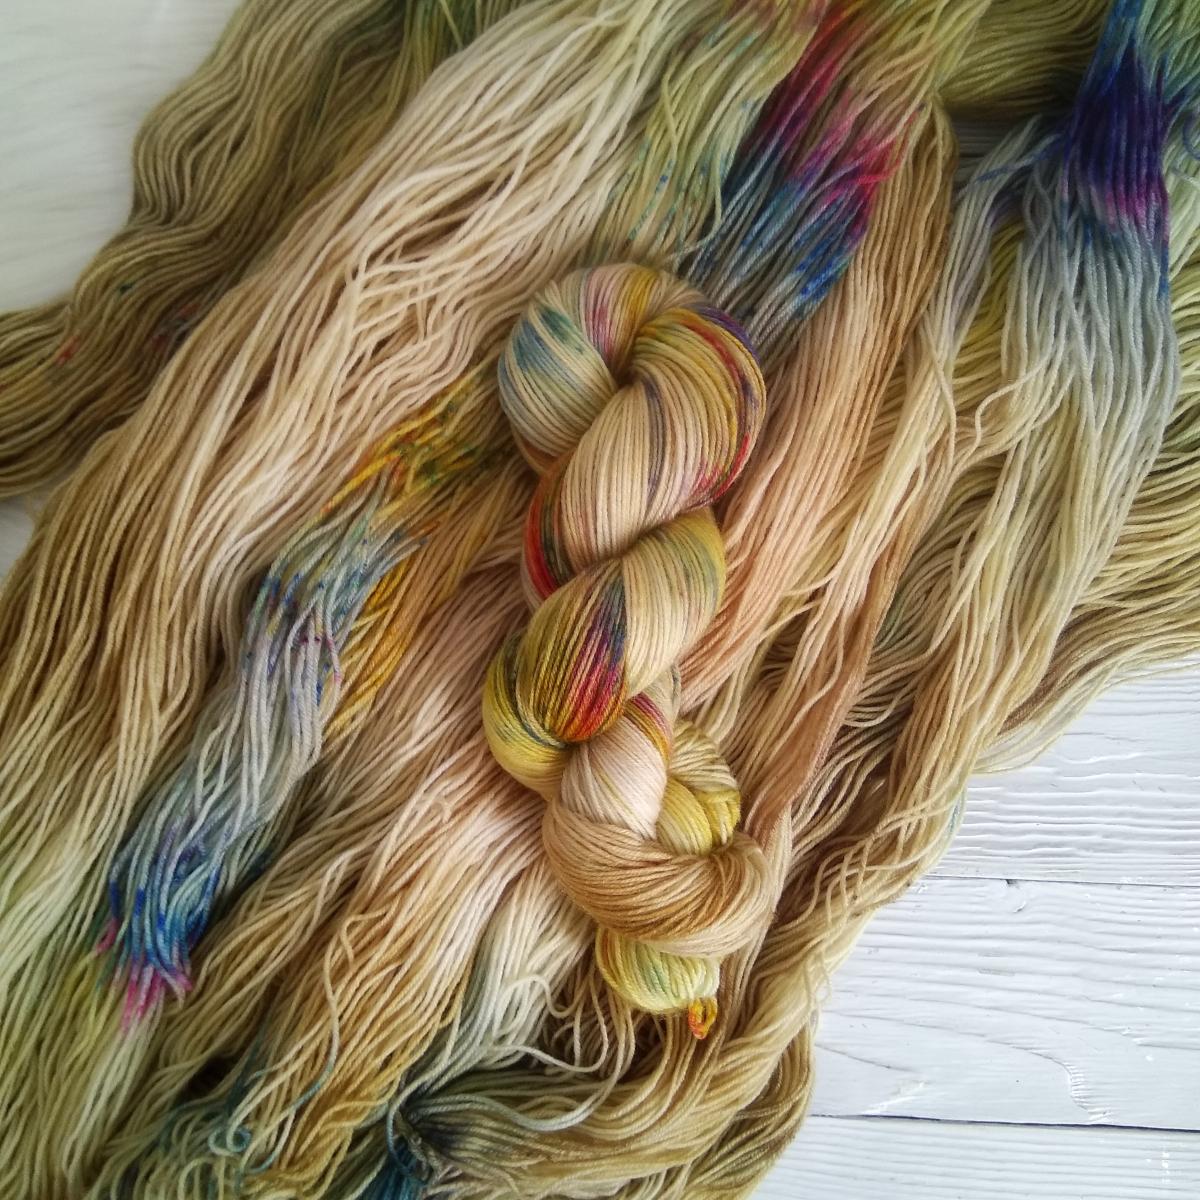 woodico.pro hand dyed yarn 032 2 1200x1200 - Hand dyed yarn / 032